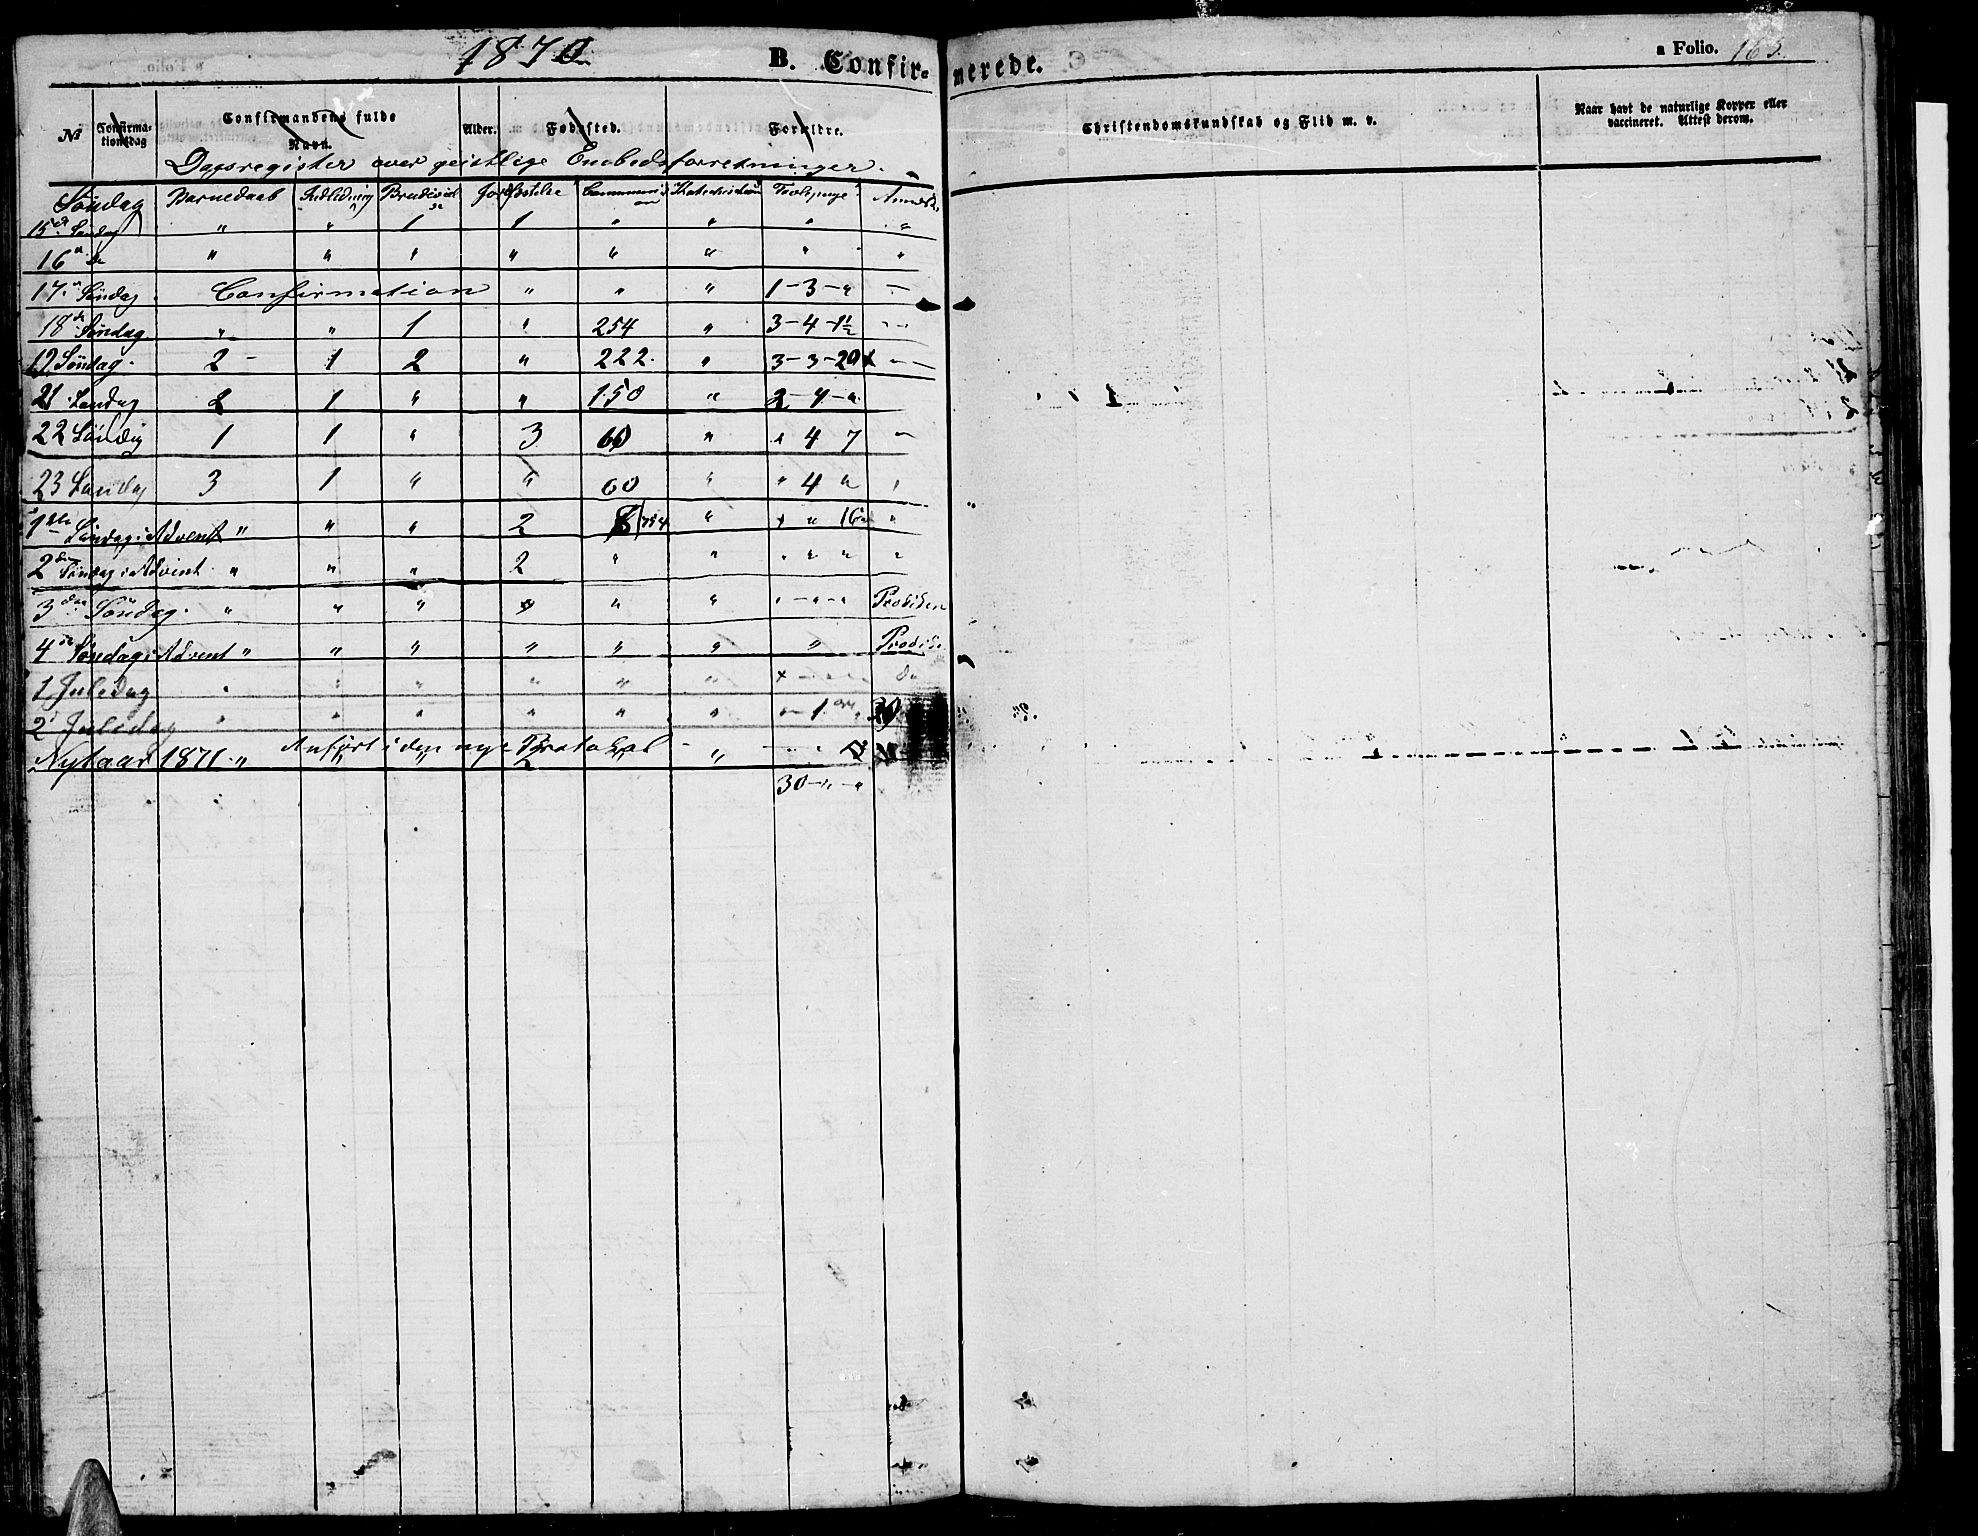 SAT, Ministerialprotokoller, klokkerbøker og fødselsregistre - Nordland, 816/L0251: Klokkerbok nr. 816C01, 1852-1870, s. 163